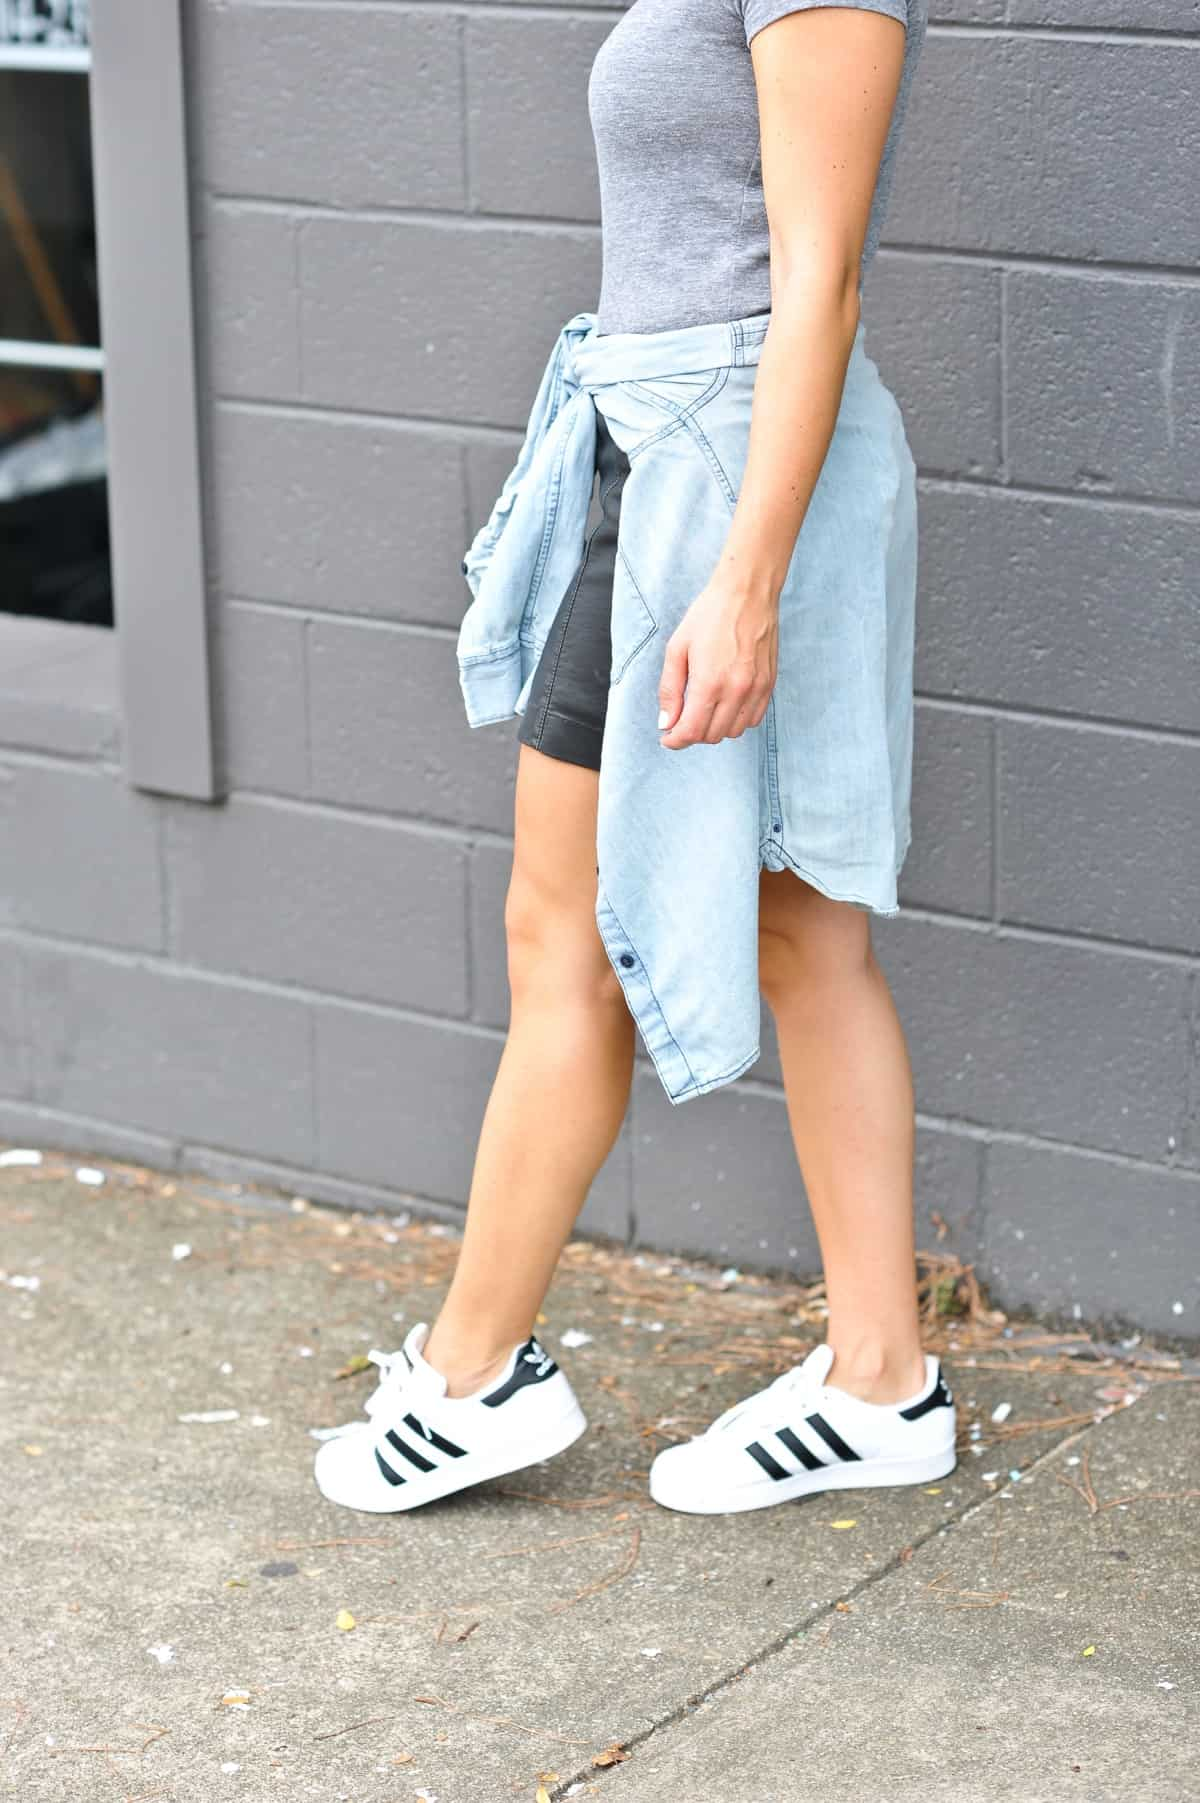 best atlanta based clothing brands, affordable outfit ideas, Adidas Superstars - My Style Vita - @mystylevita - 24